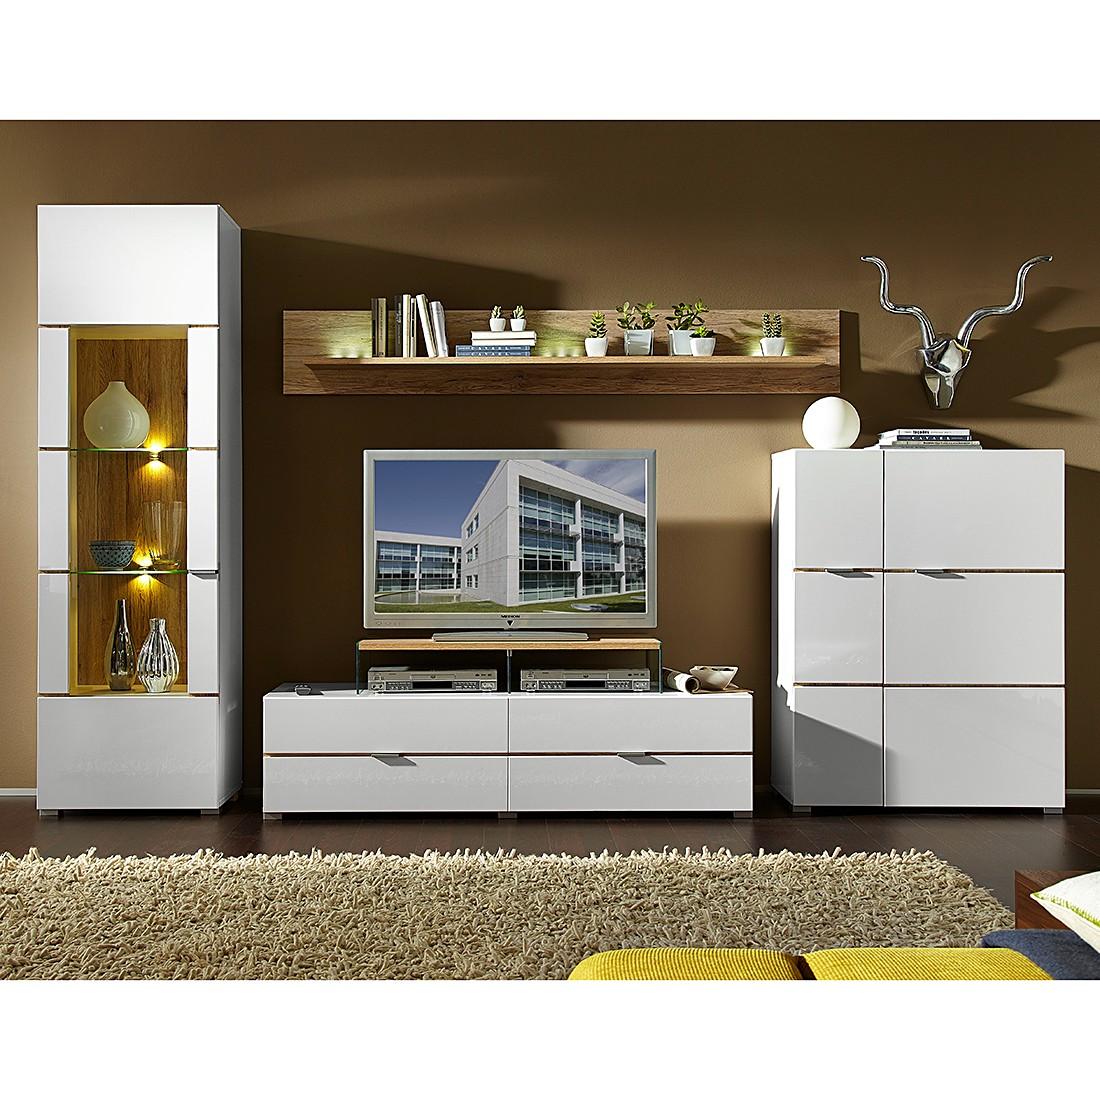 eek a wohnwand hamilton i 4 teilig inklusive beleuchtung hochglanz wei eiche sanremo. Black Bedroom Furniture Sets. Home Design Ideas